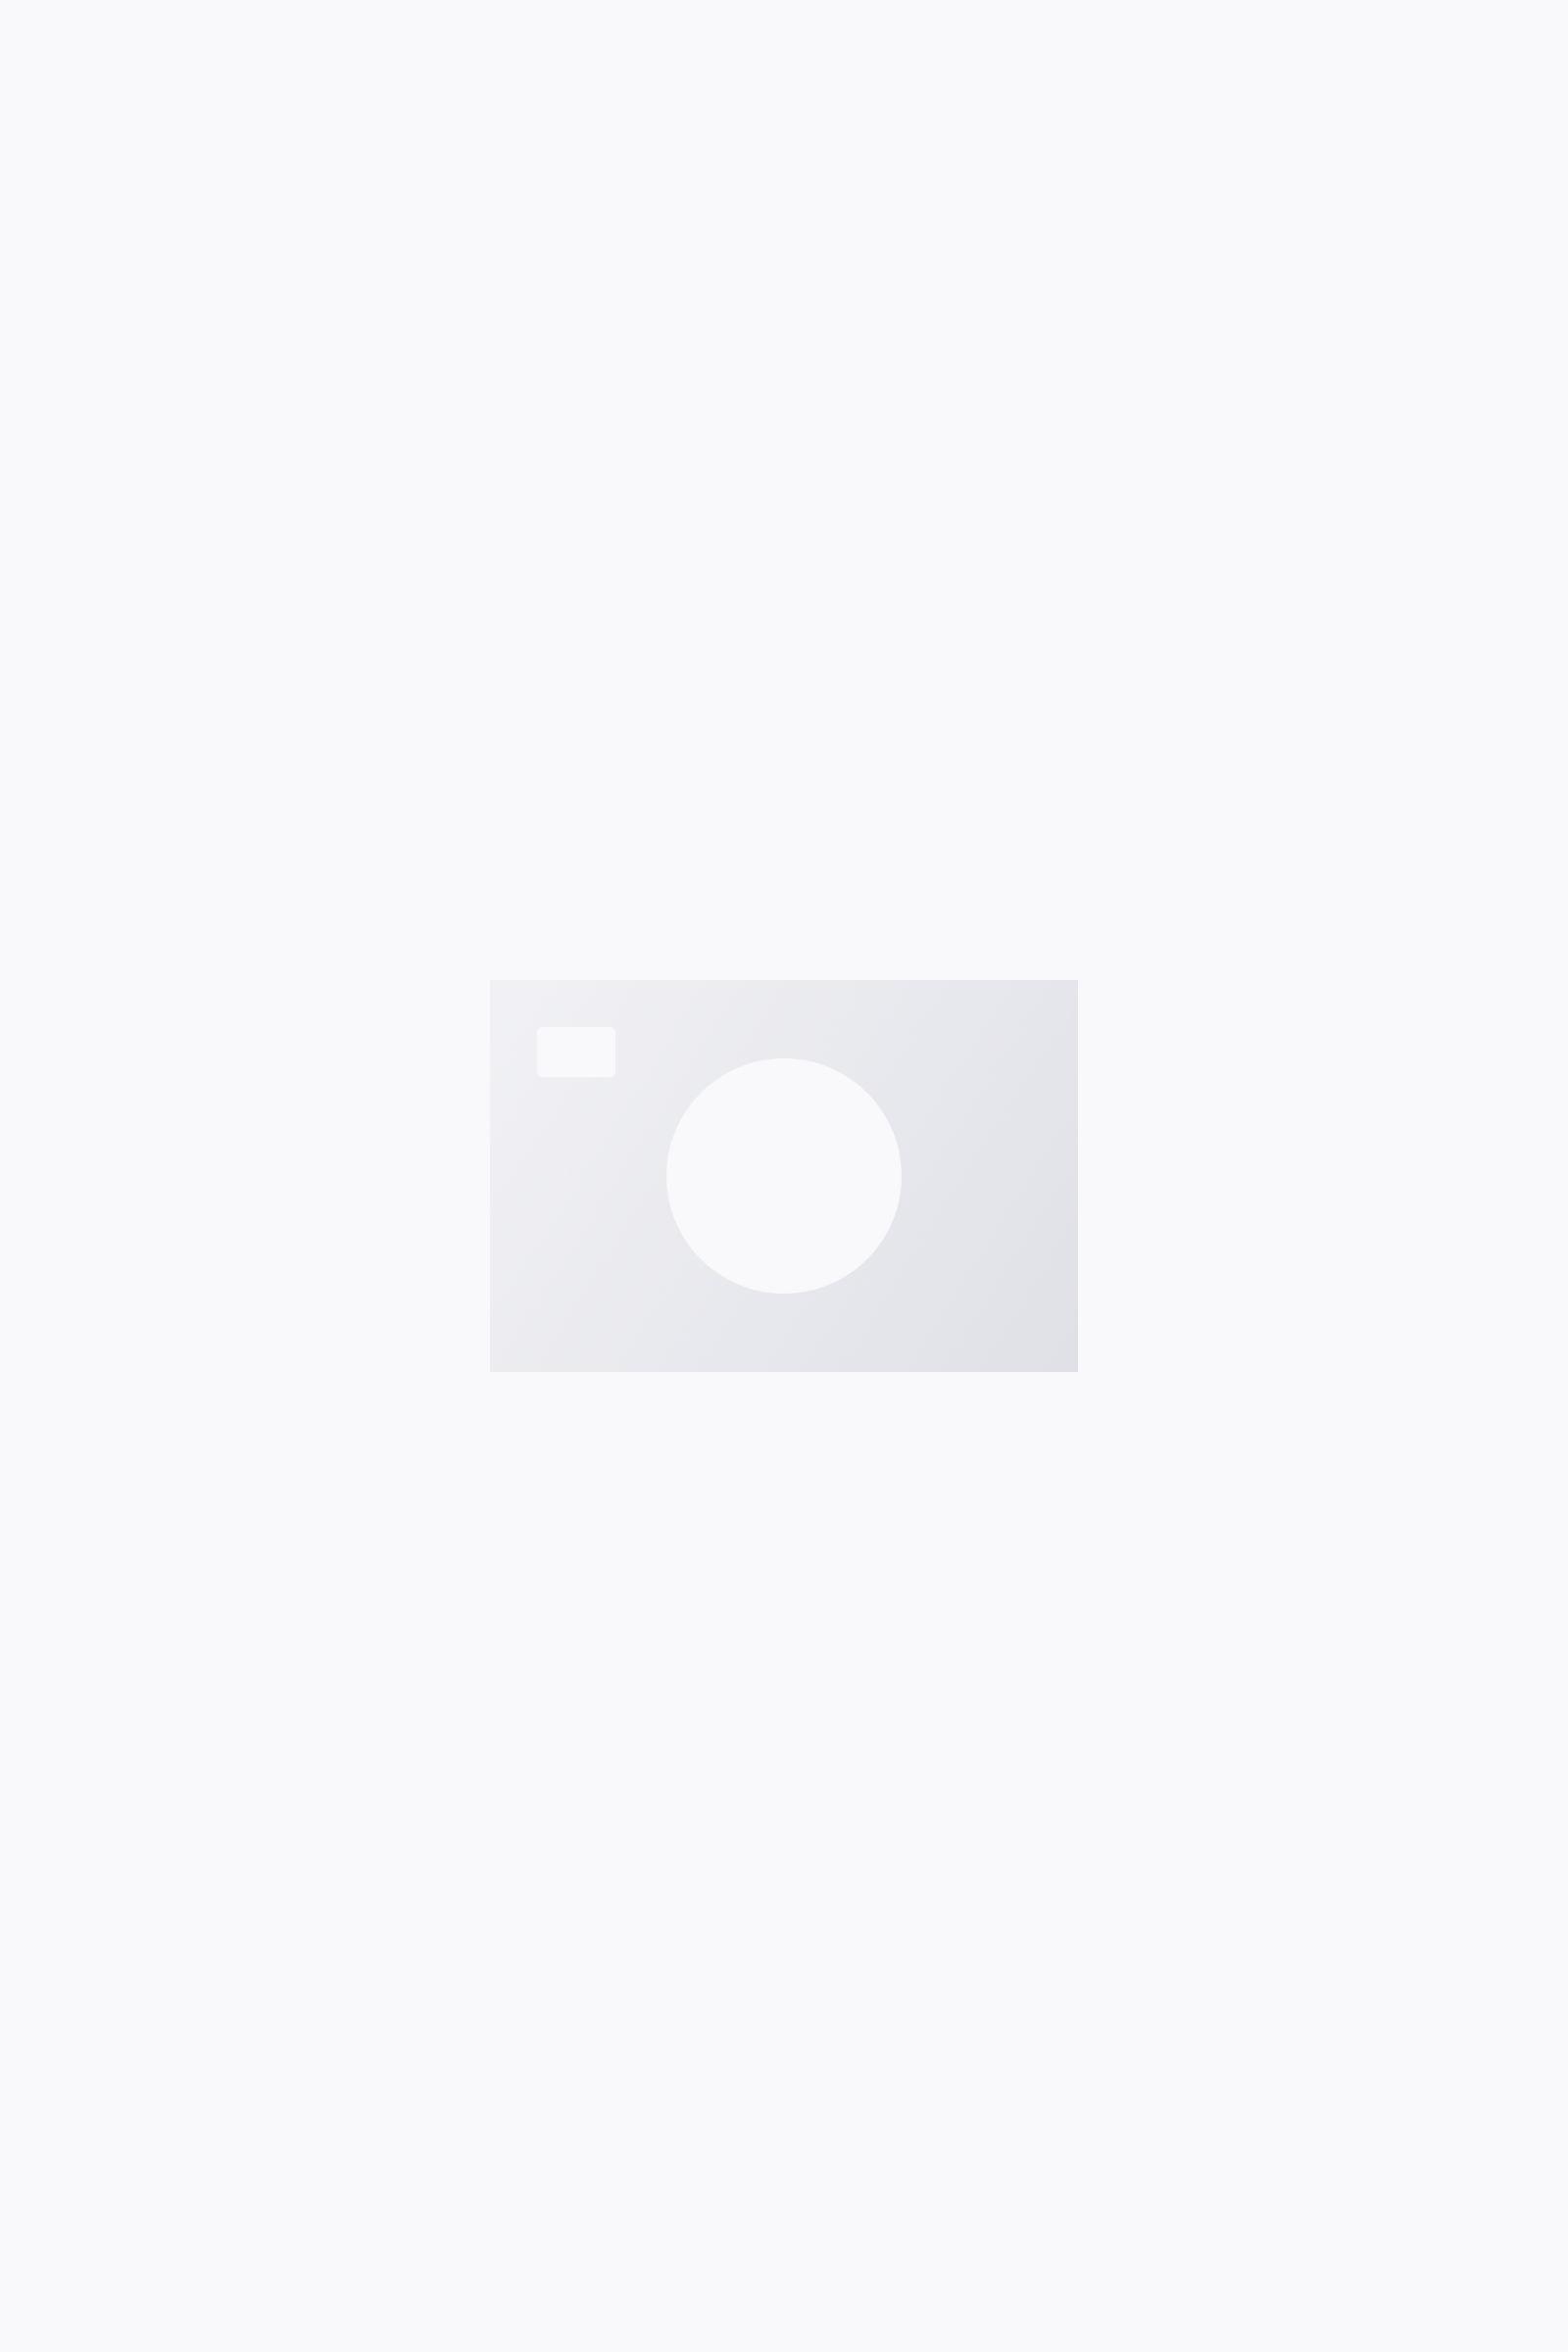 COS REGULAR-FIT T-SHIRT,yellow